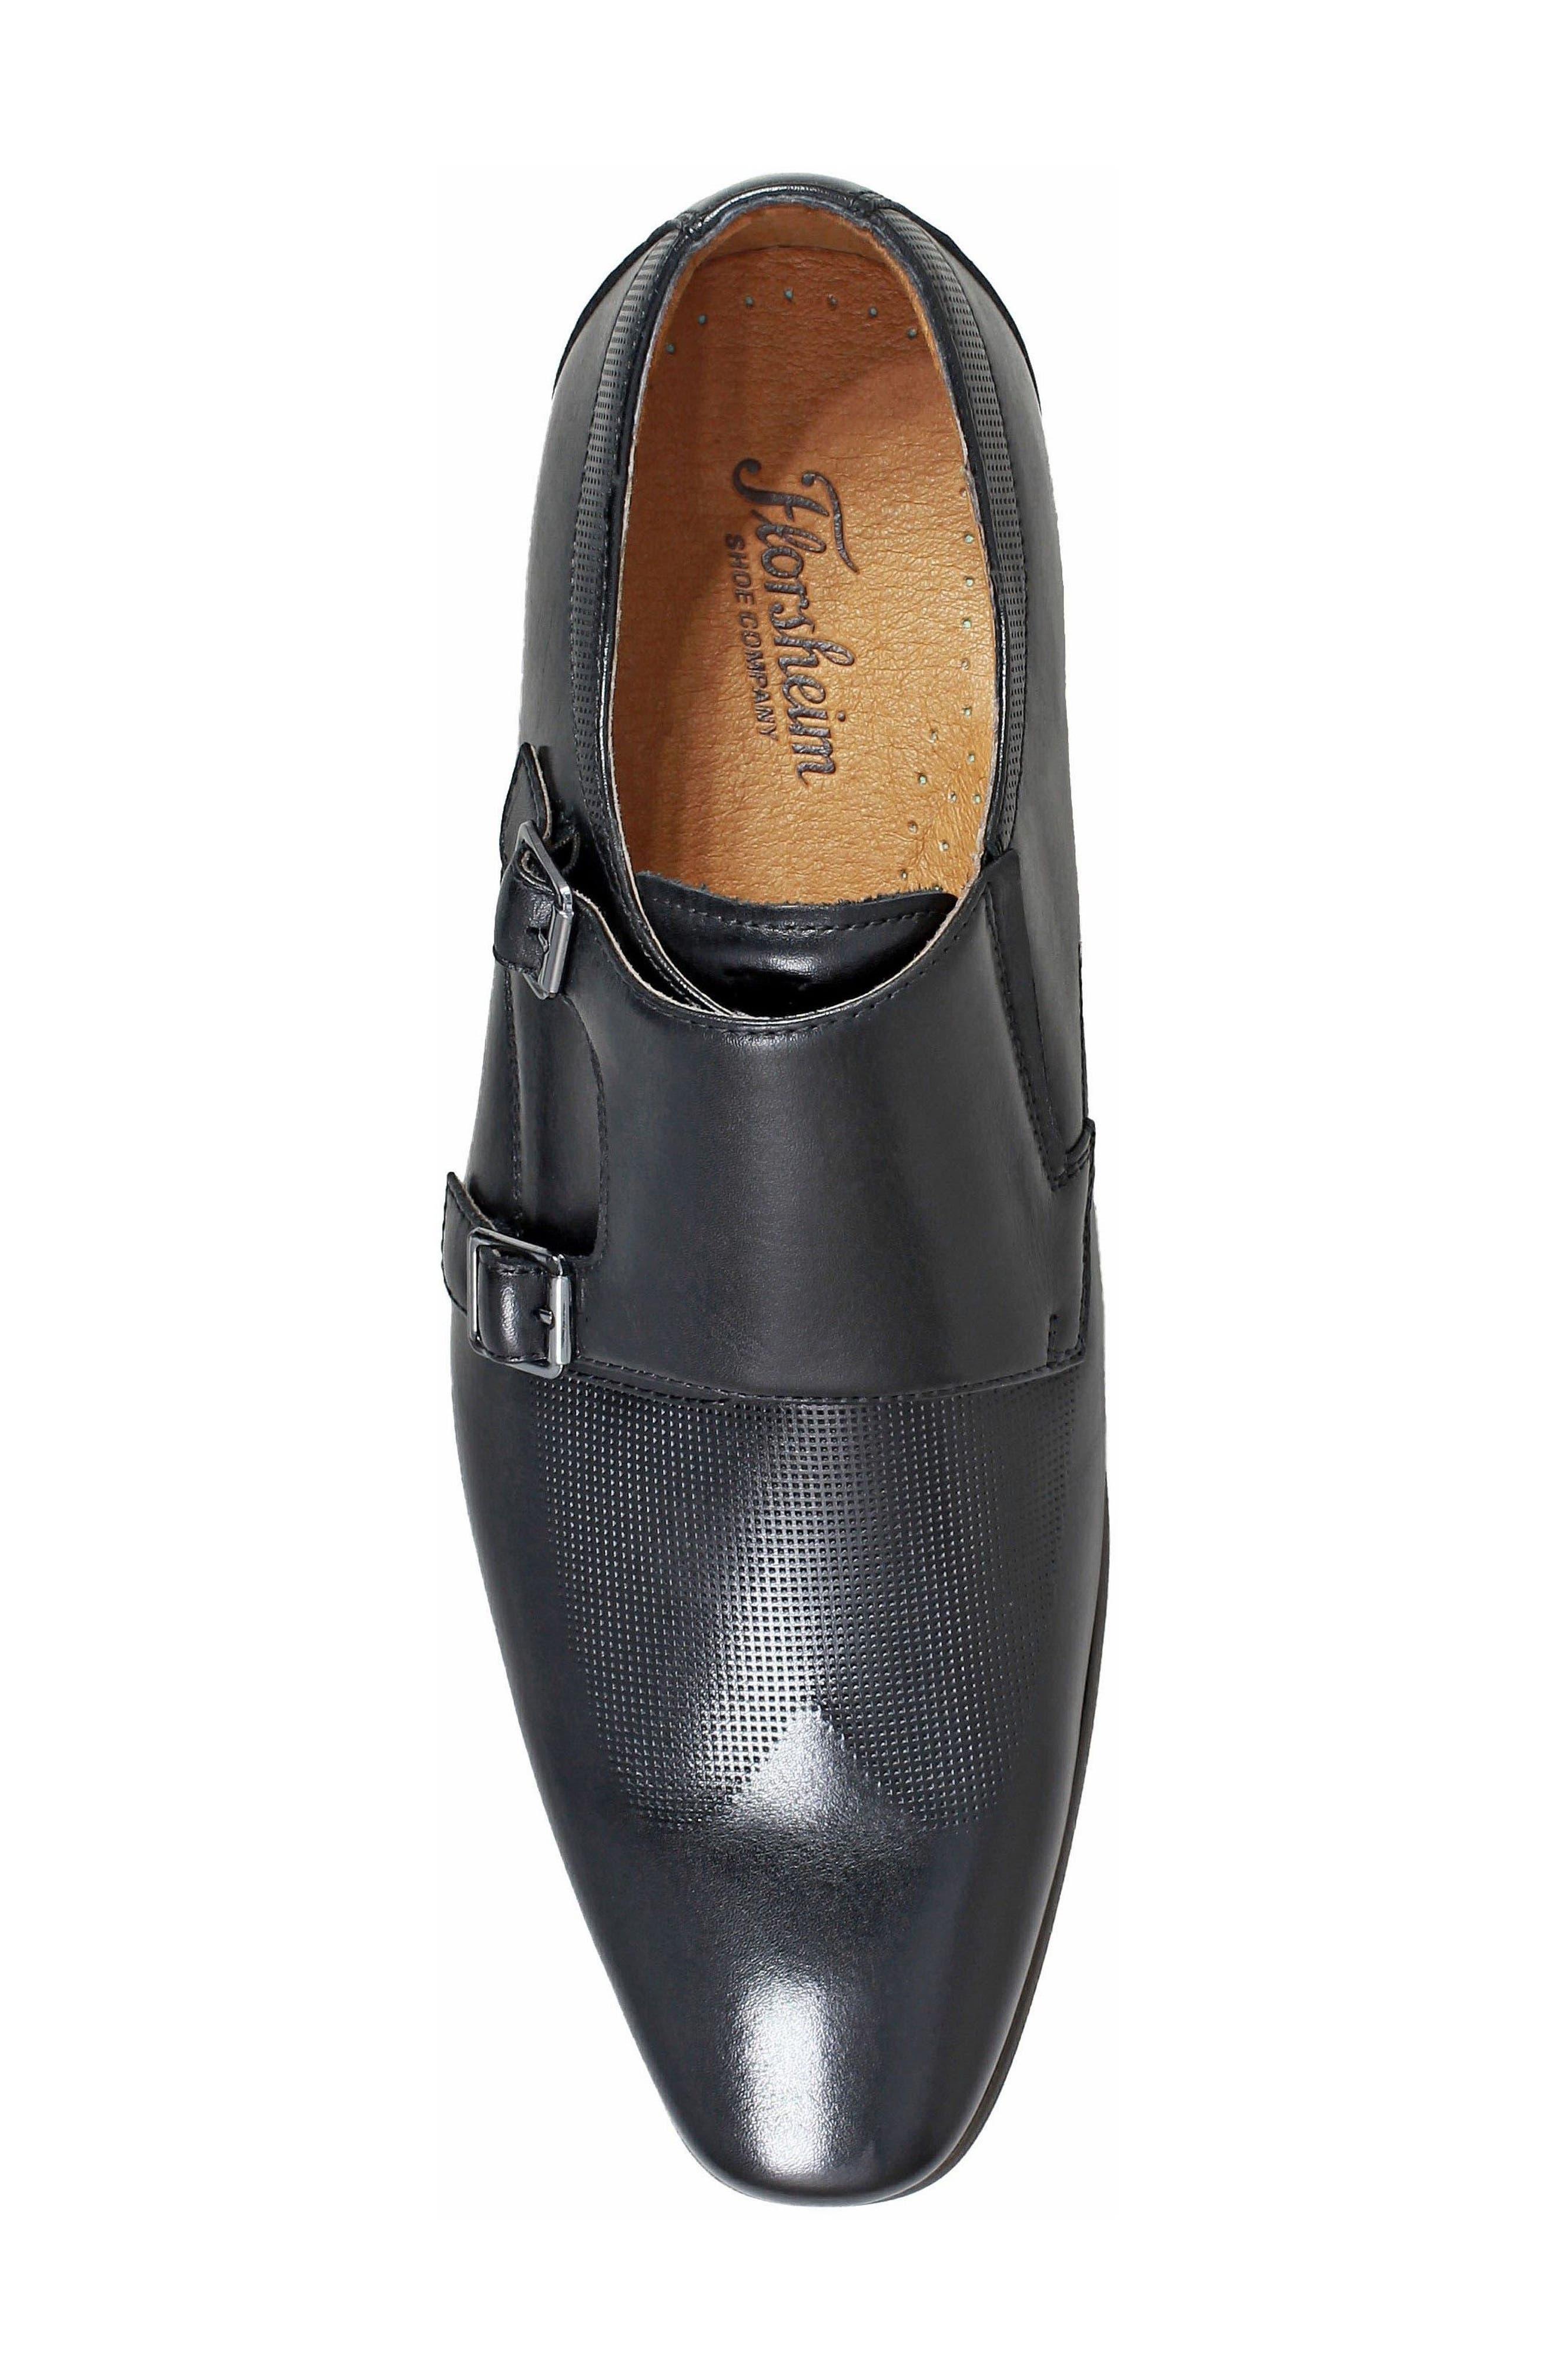 FLORSHEIM, Postino Textured Double Strap Monk Shoe, Alternate thumbnail 5, color, BLACK LEATHER